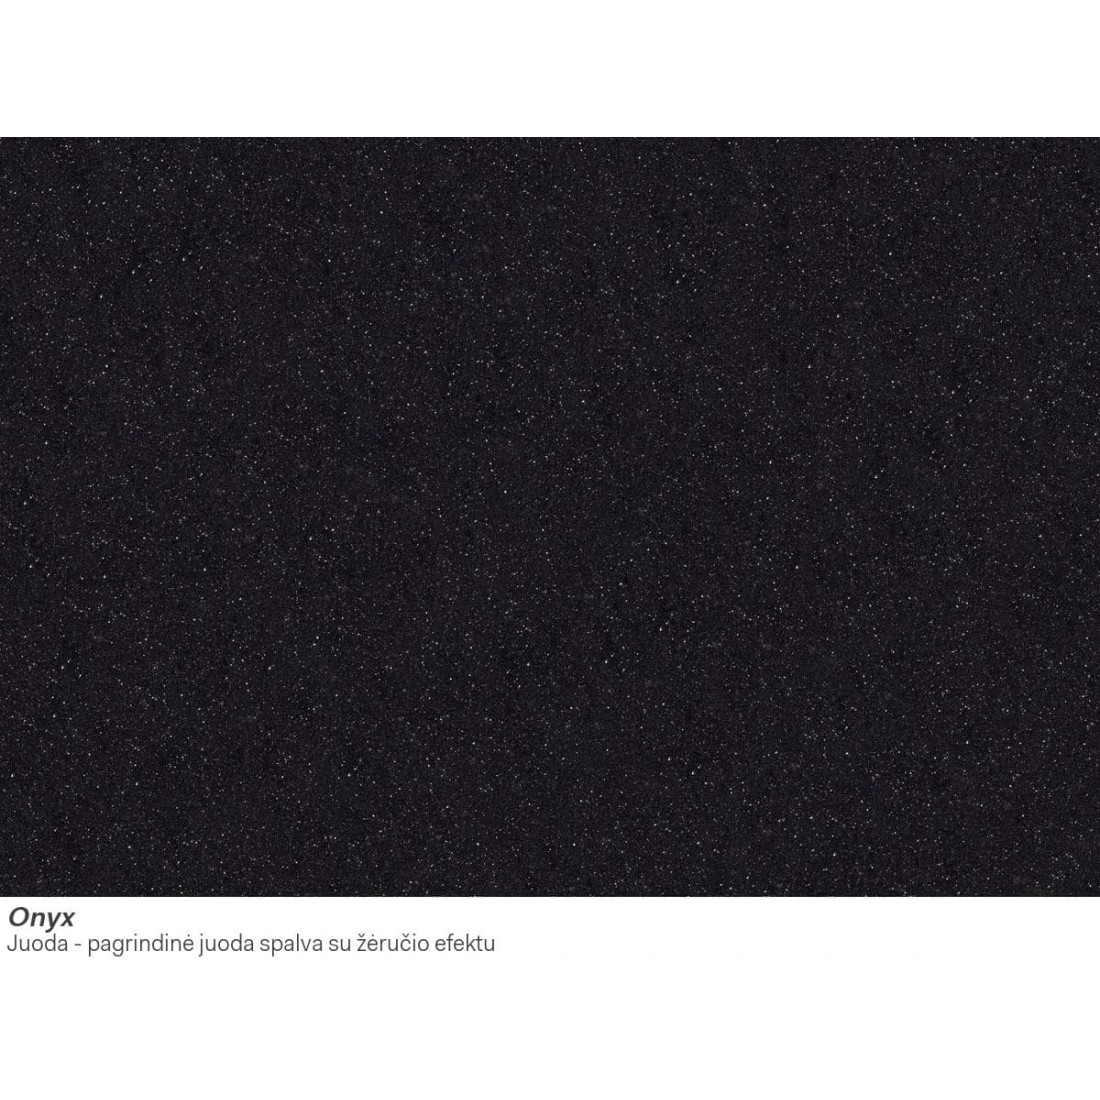 Akmens masės plautuvė Franke FX FXG 661, Onyx